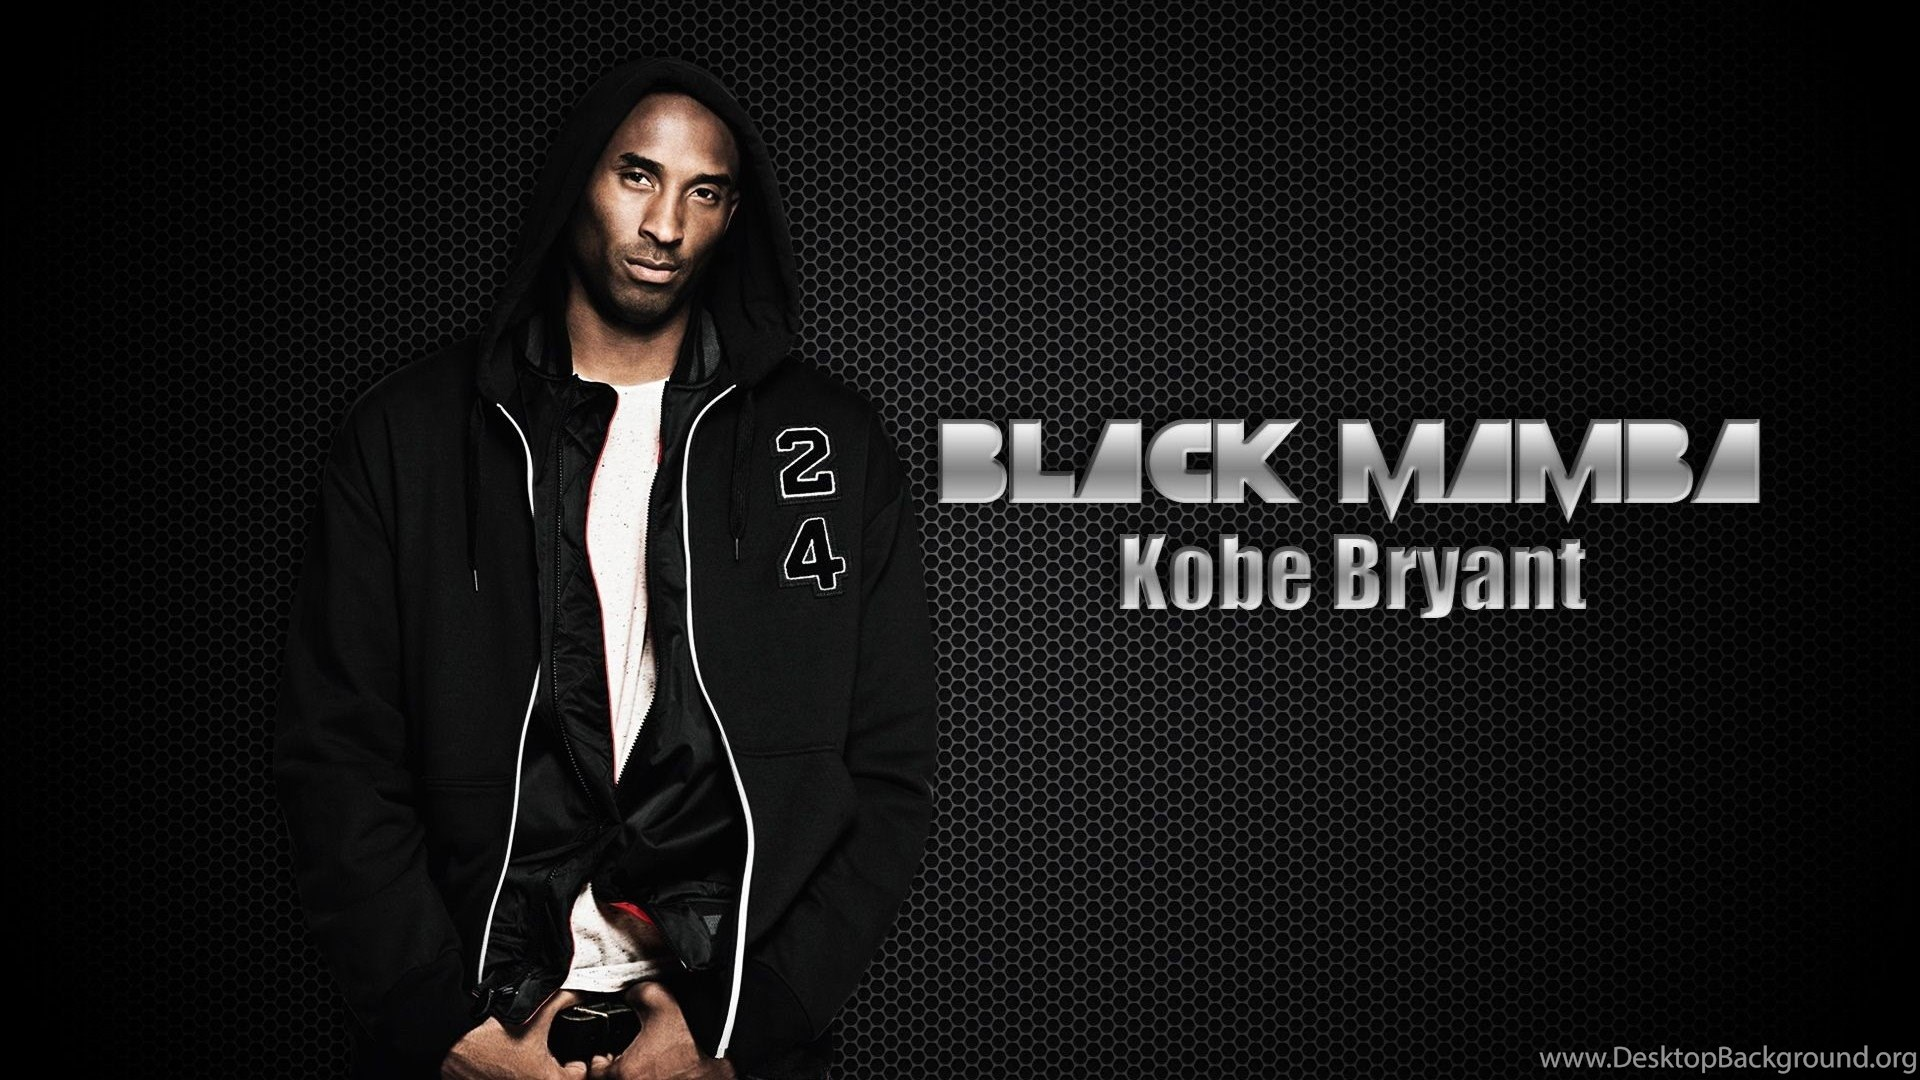 Kobe Bryant Black Mamba 1920x1080 Hd Wallpapers And Free Stock